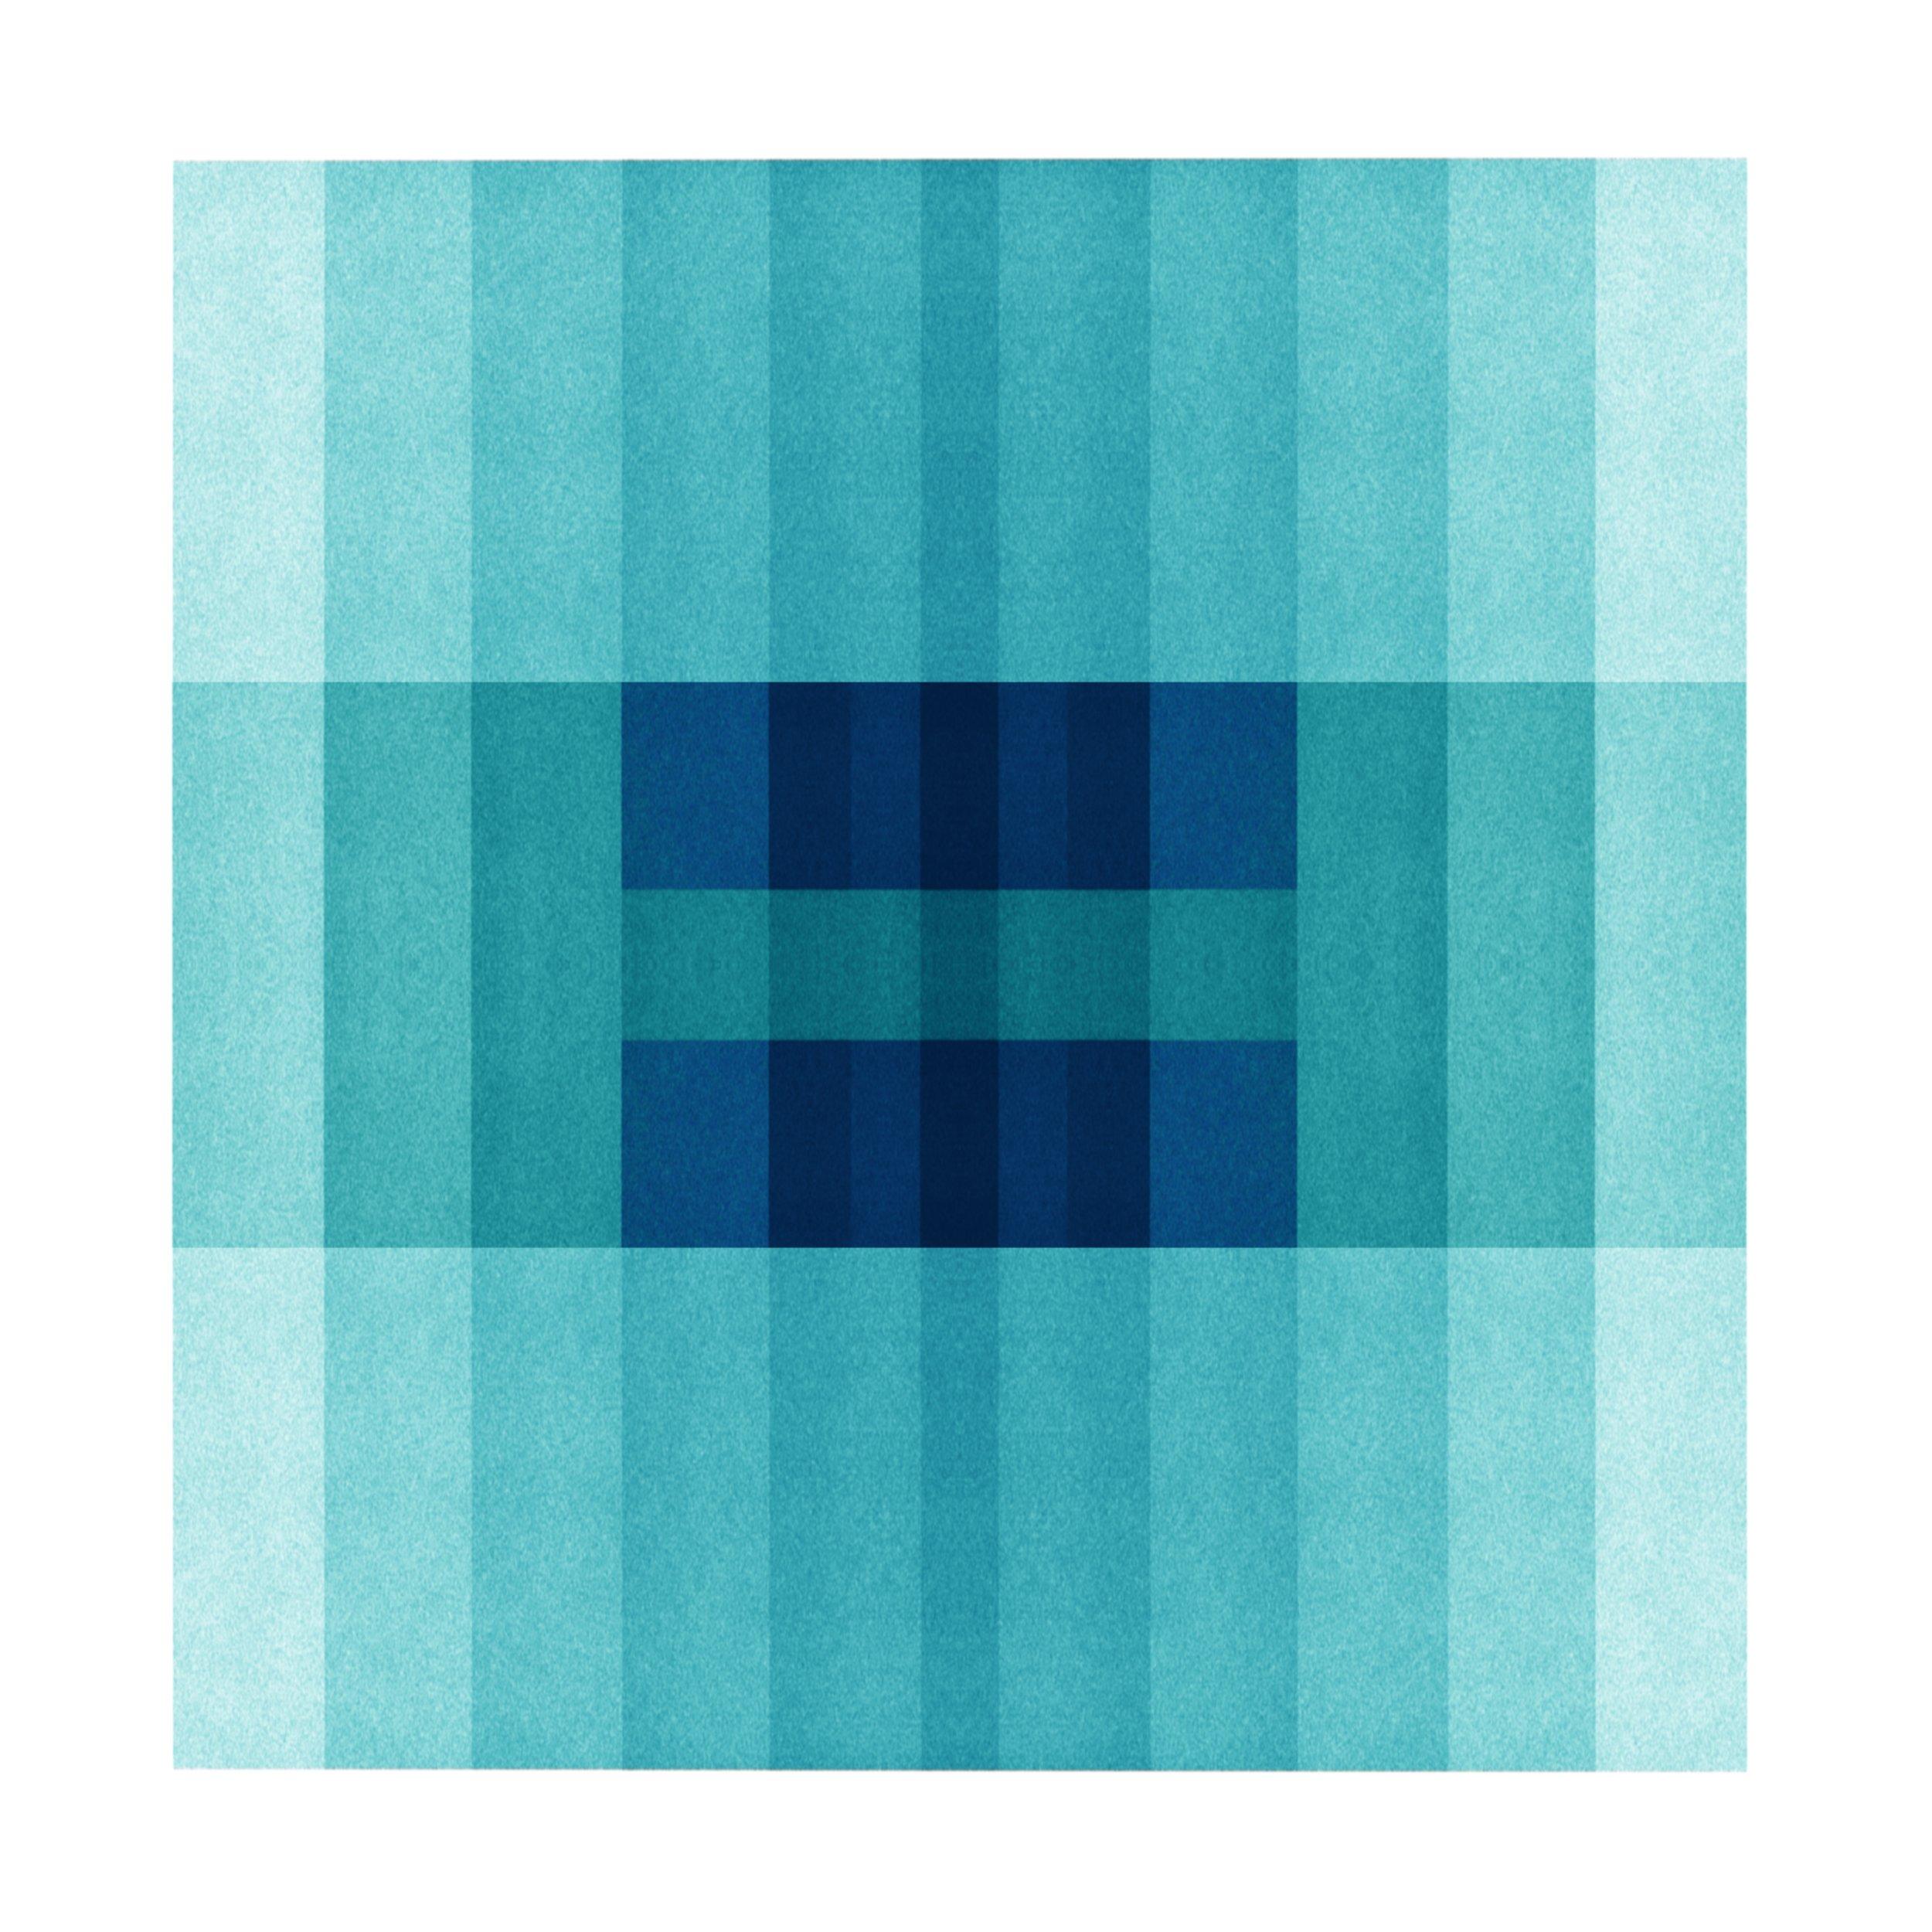 Color Space 30: Ocean Blue